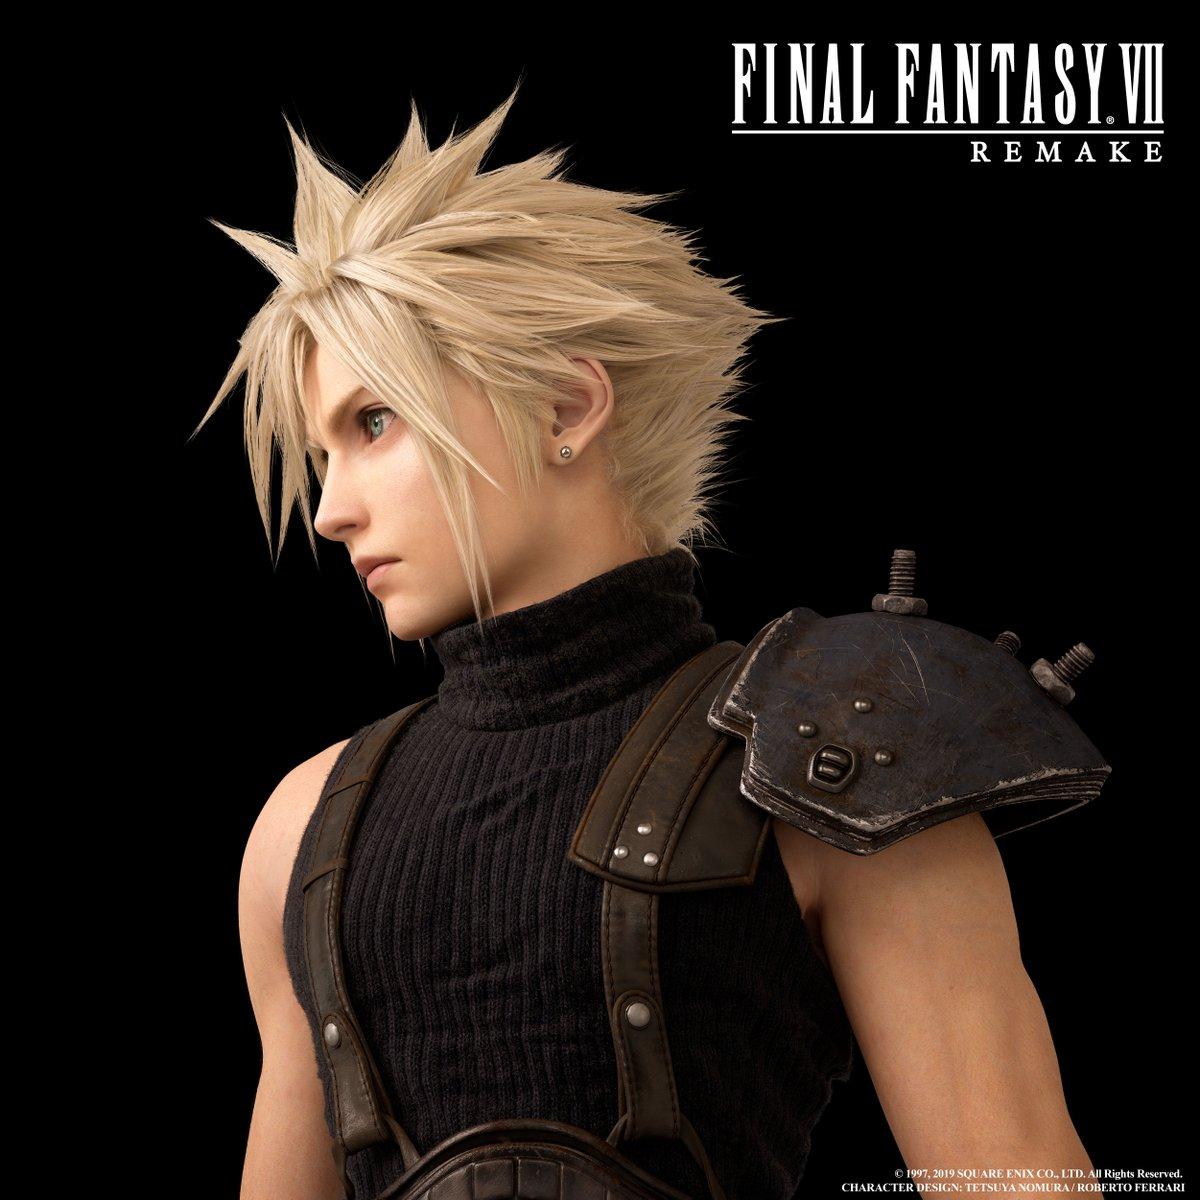 High Resolution Final Fantasy Vii Remake Character Renders E32019 Final Fantasy Vii Final Fantasy Vii Cloud Final Fantasy